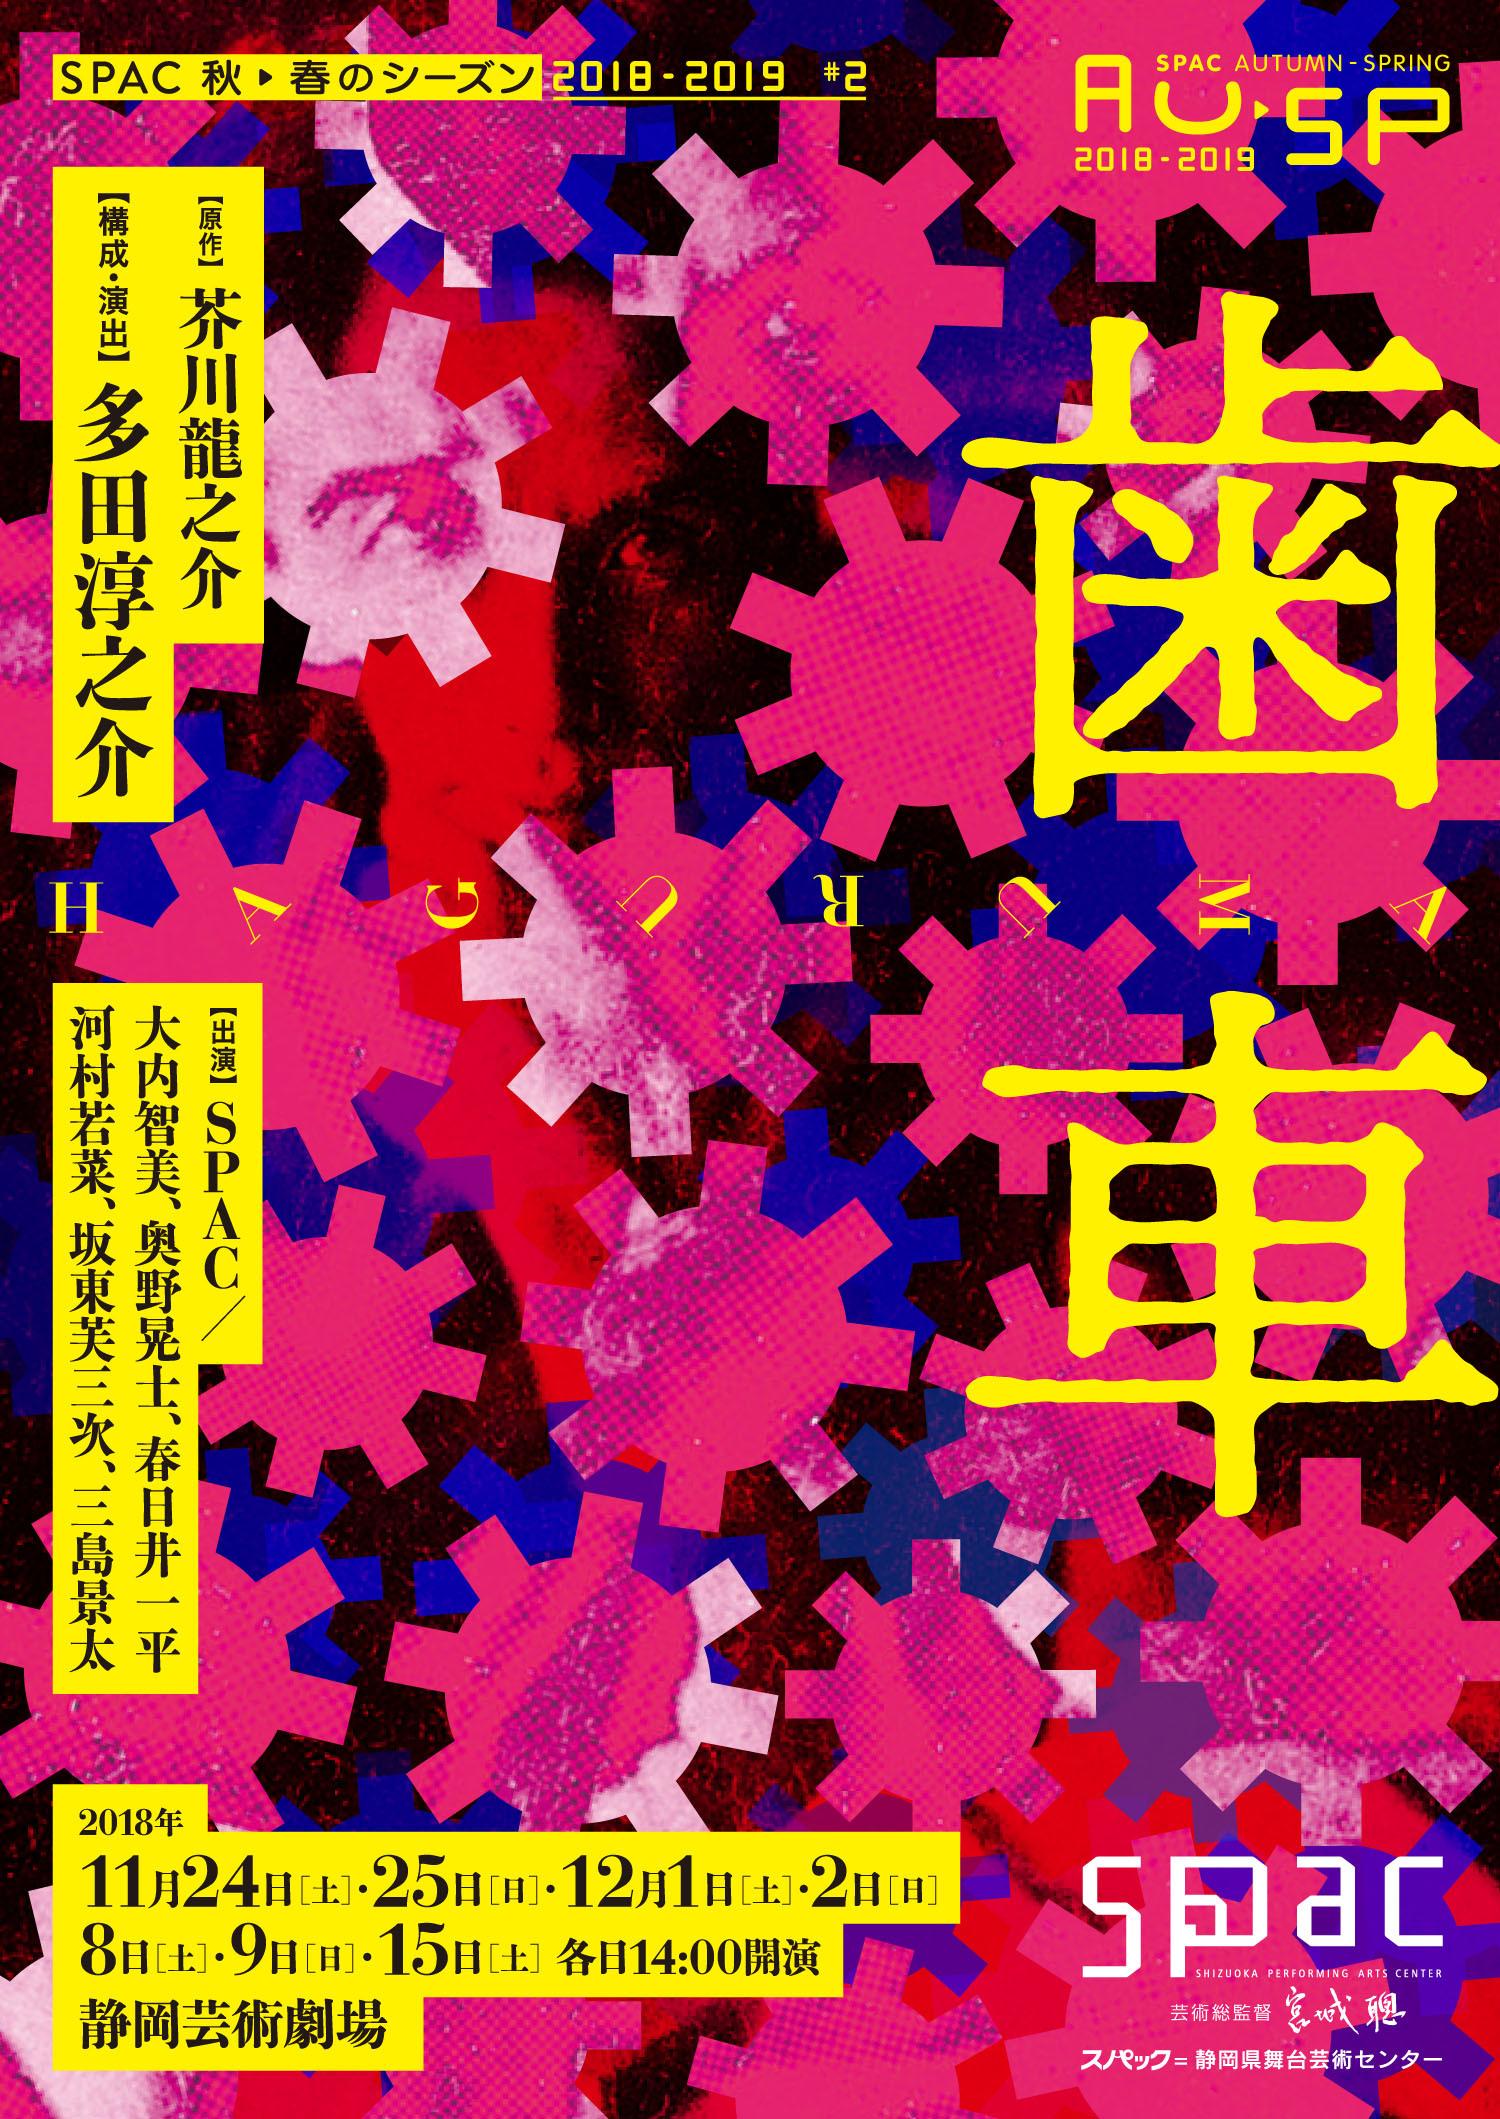 SPAC公演『歯車』(芥川龍之介原作、多田淳之介構成・演出)のチラシ。